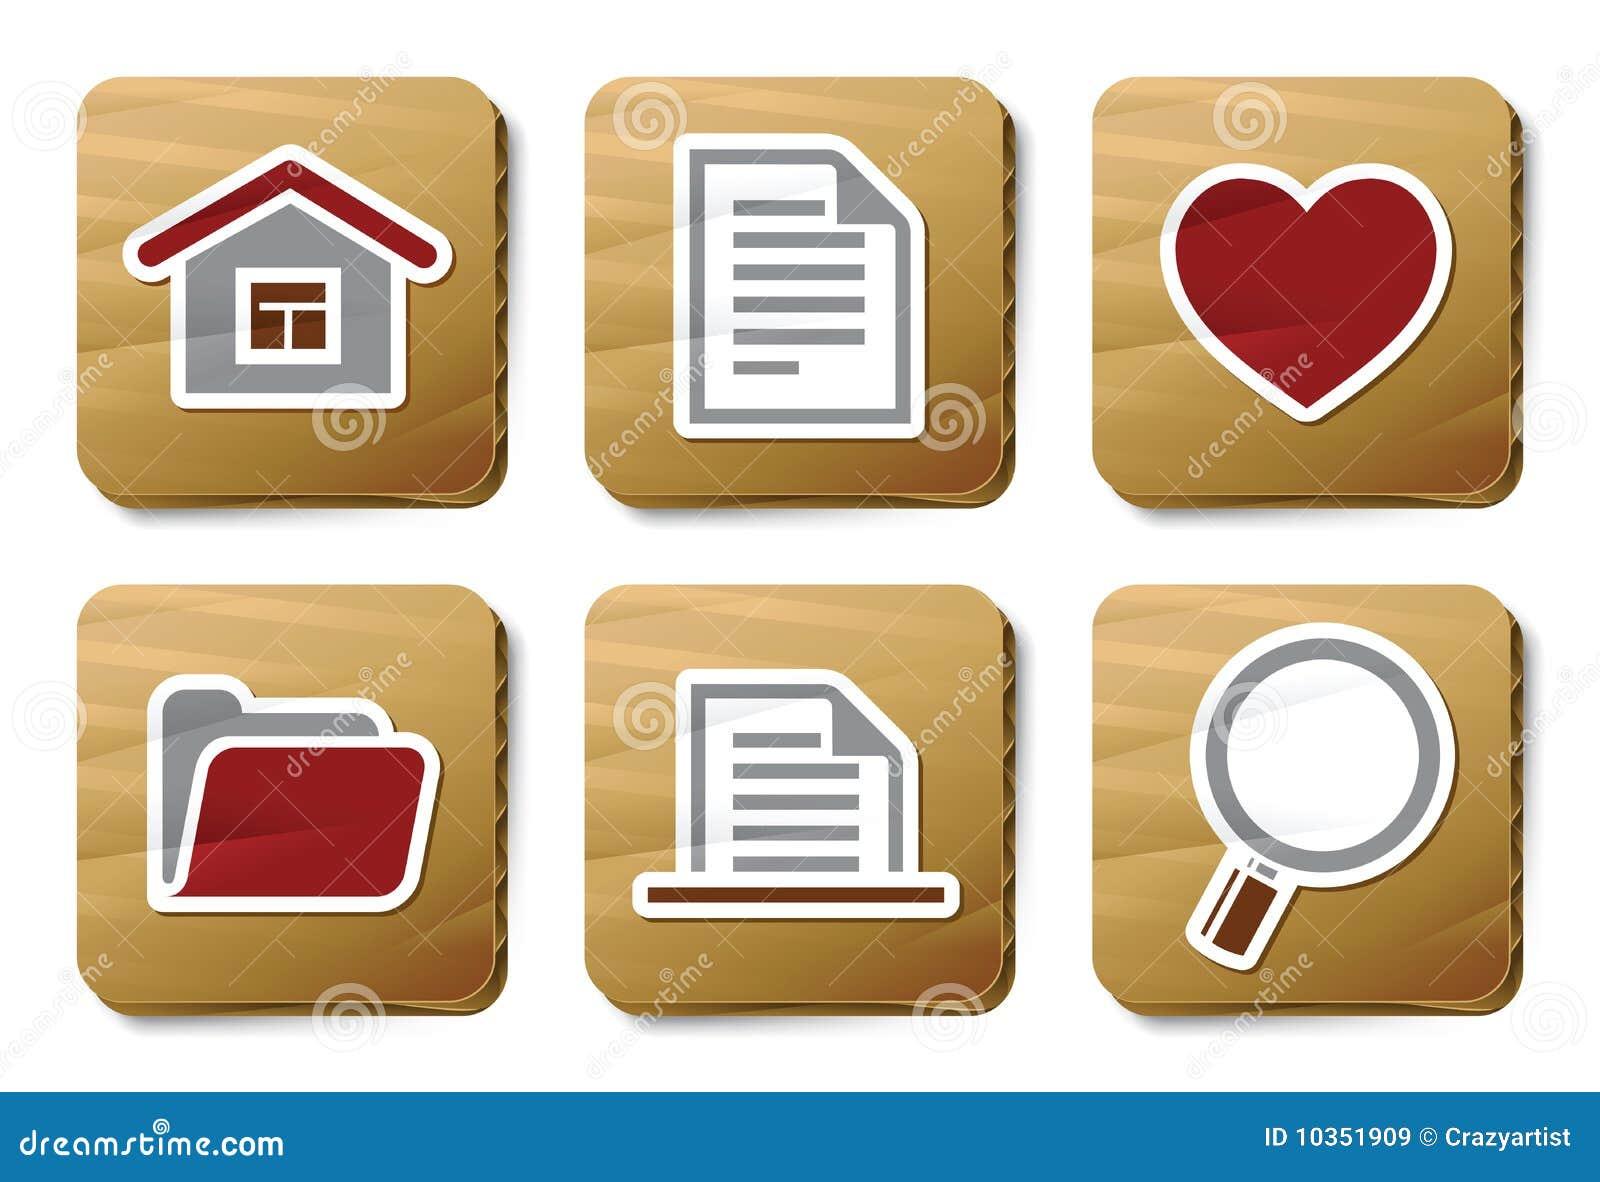 Basic icons | Cardboard series